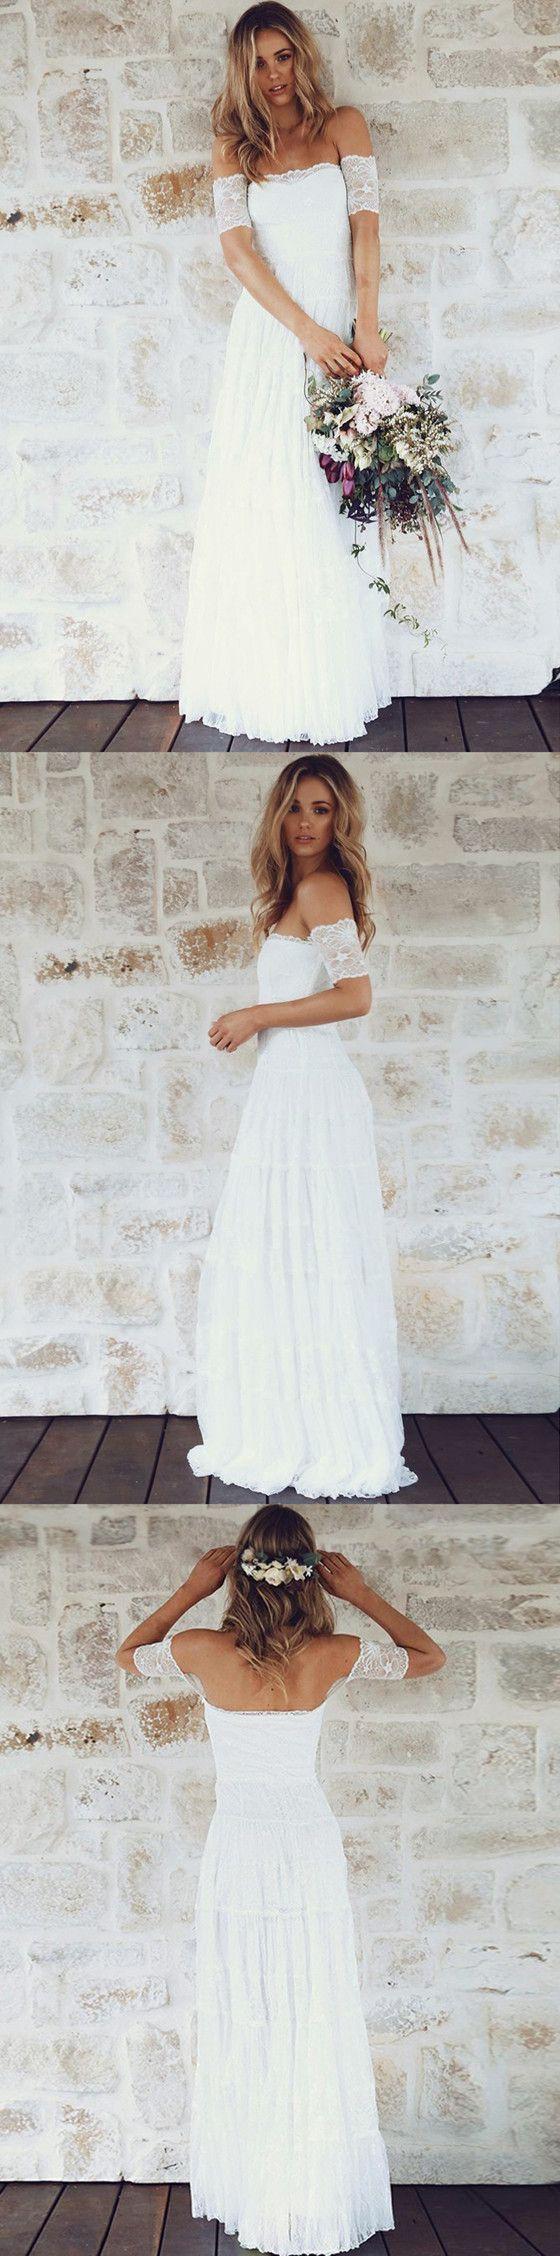 A-Line Modern Floor-length Off-the-Shoulder Short Sleeves Lace Beach Wedding Dress, WD0329